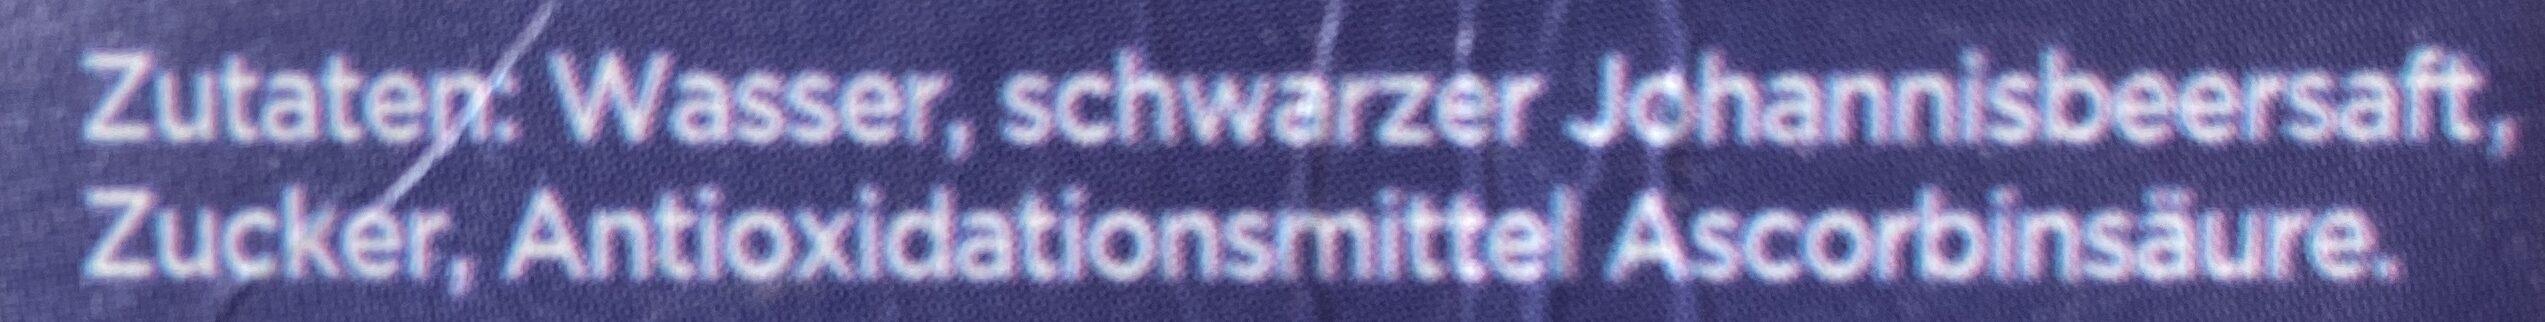 Schwarze Johannisbeere Nektar - Ingredienti - de